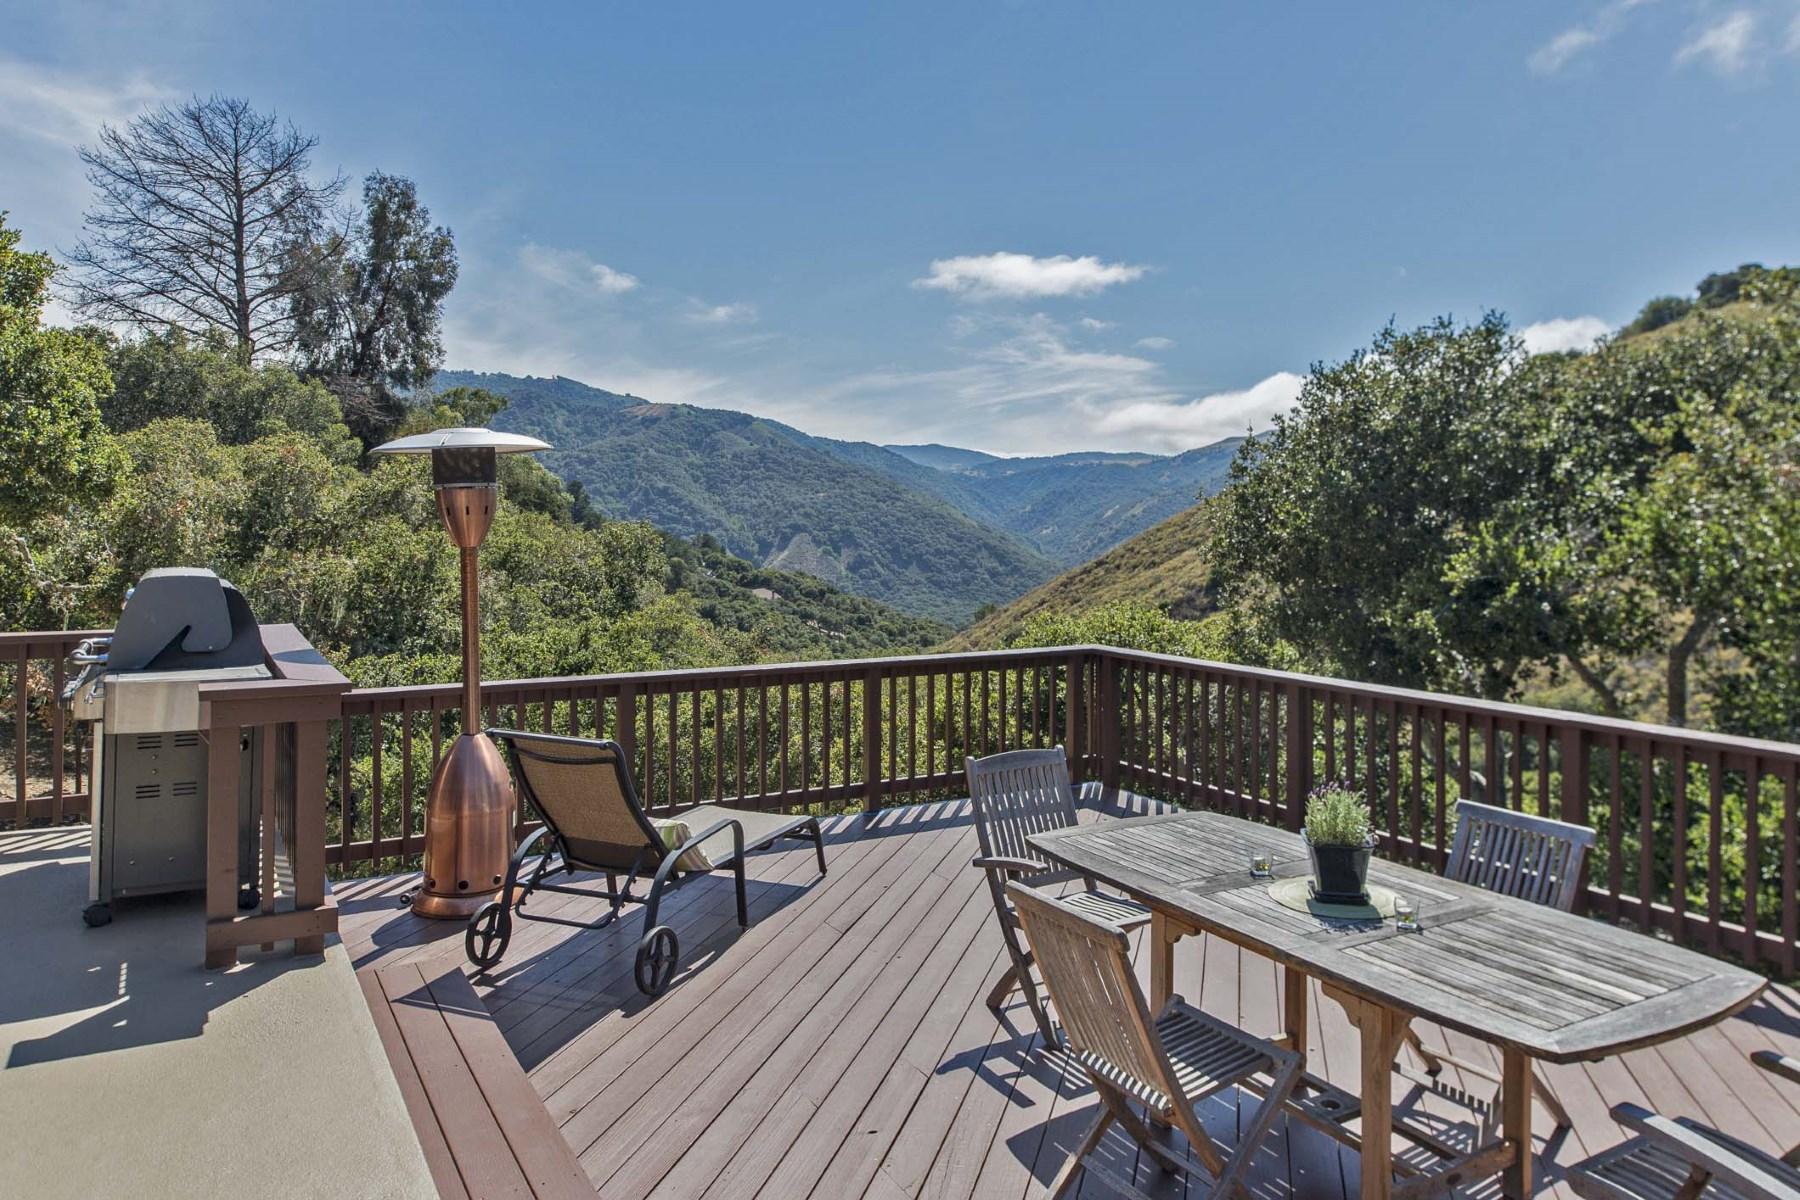 Moradia para Venda às Big Carmel Valley Views and Privacy 760 Country Club Drive Carmel Valley, Califórnia 93924 Estados Unidos